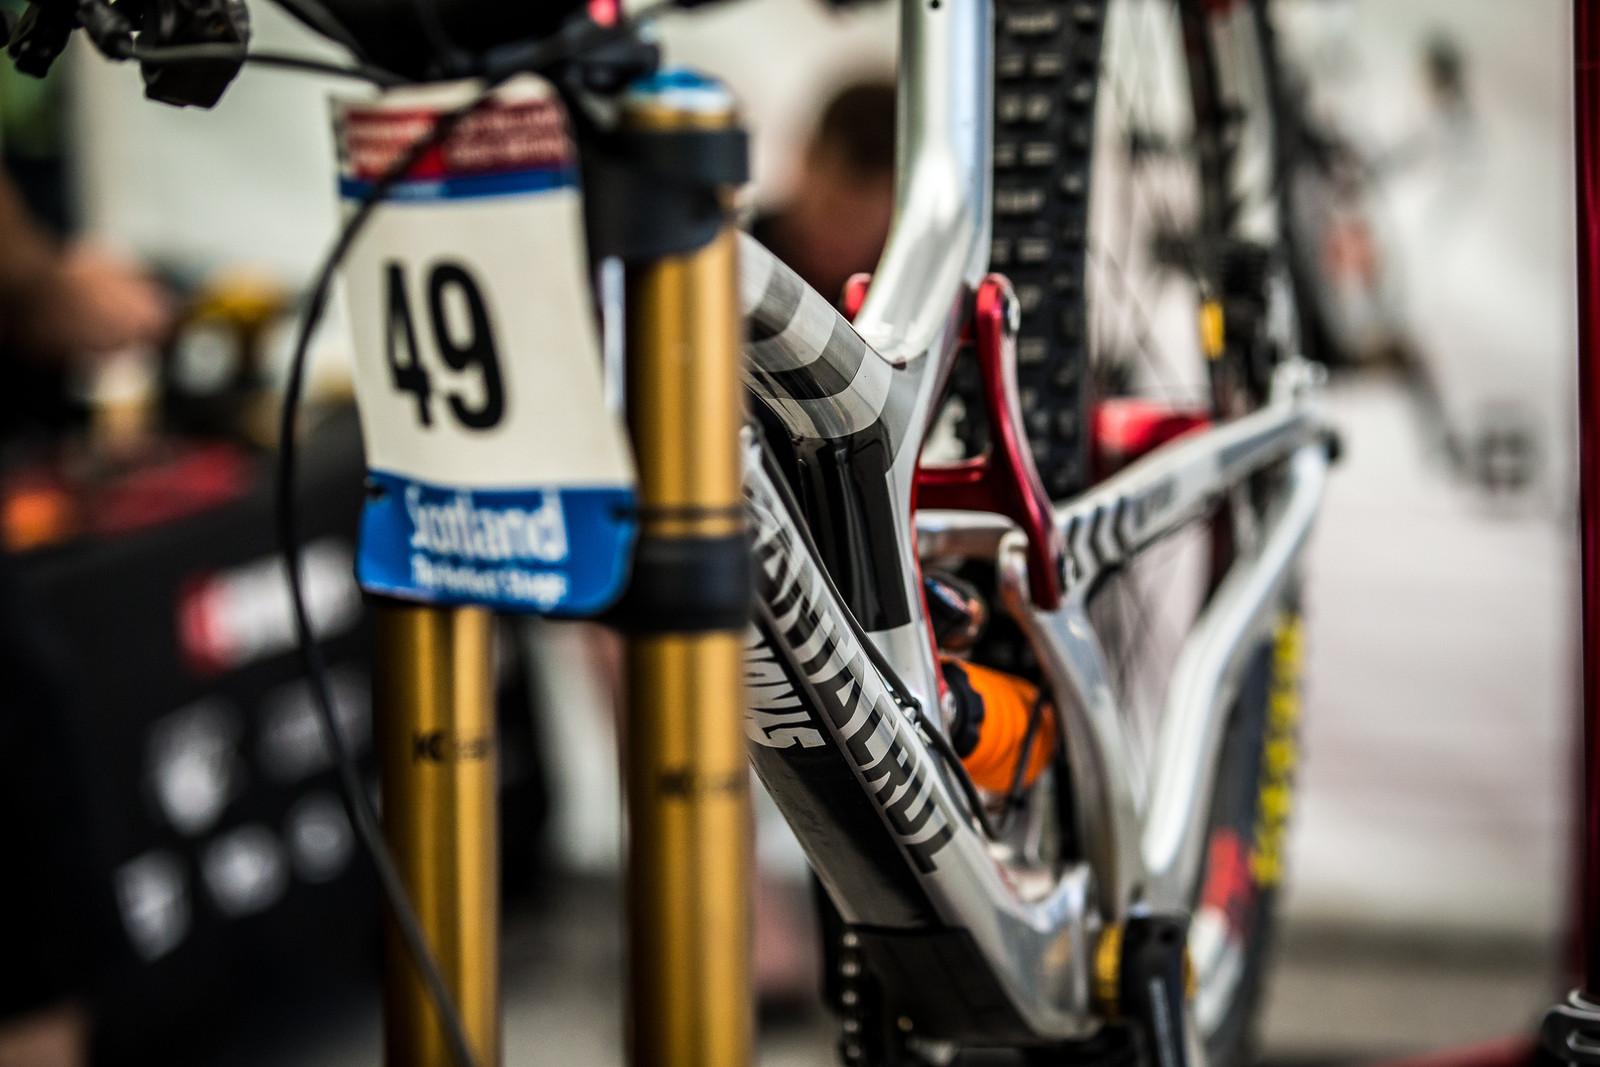 Santa Cruz V10cc 29er - 2017 Leogang World Cup Pit Bits - Mountain Biking Pictures - Vital MTB